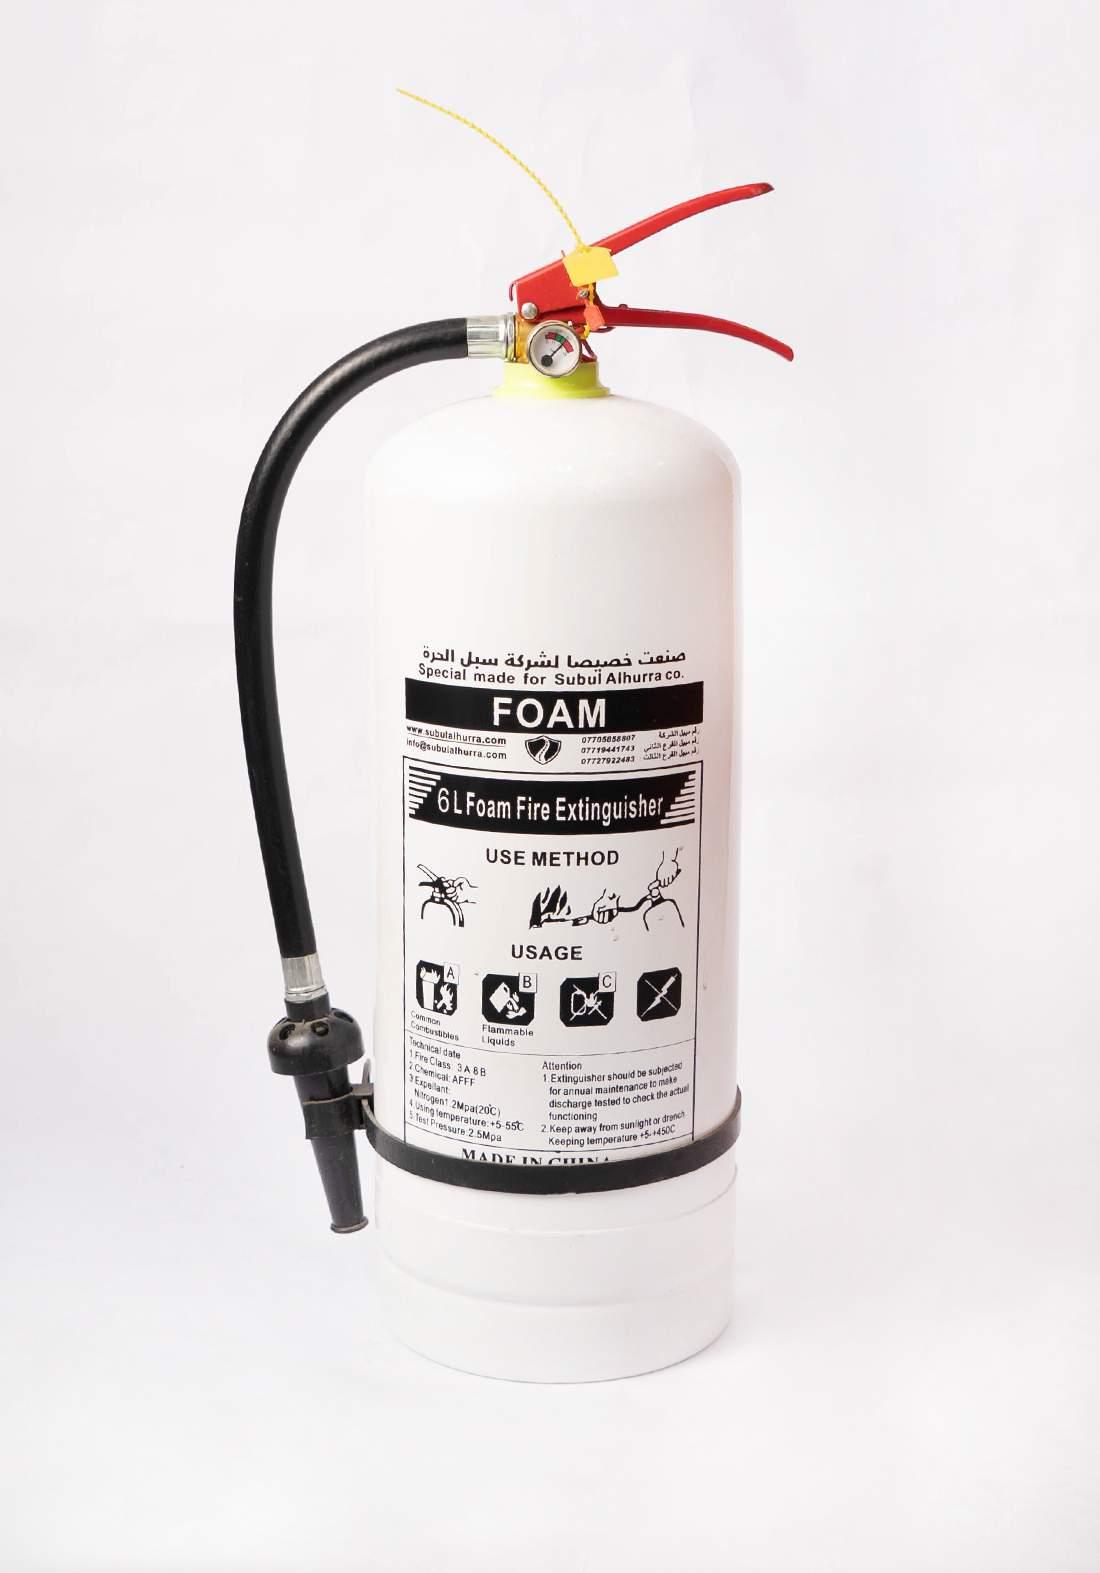 Subul Alhurra Foam Fire Extinguisher 6 L مطفأة حريق رغوية